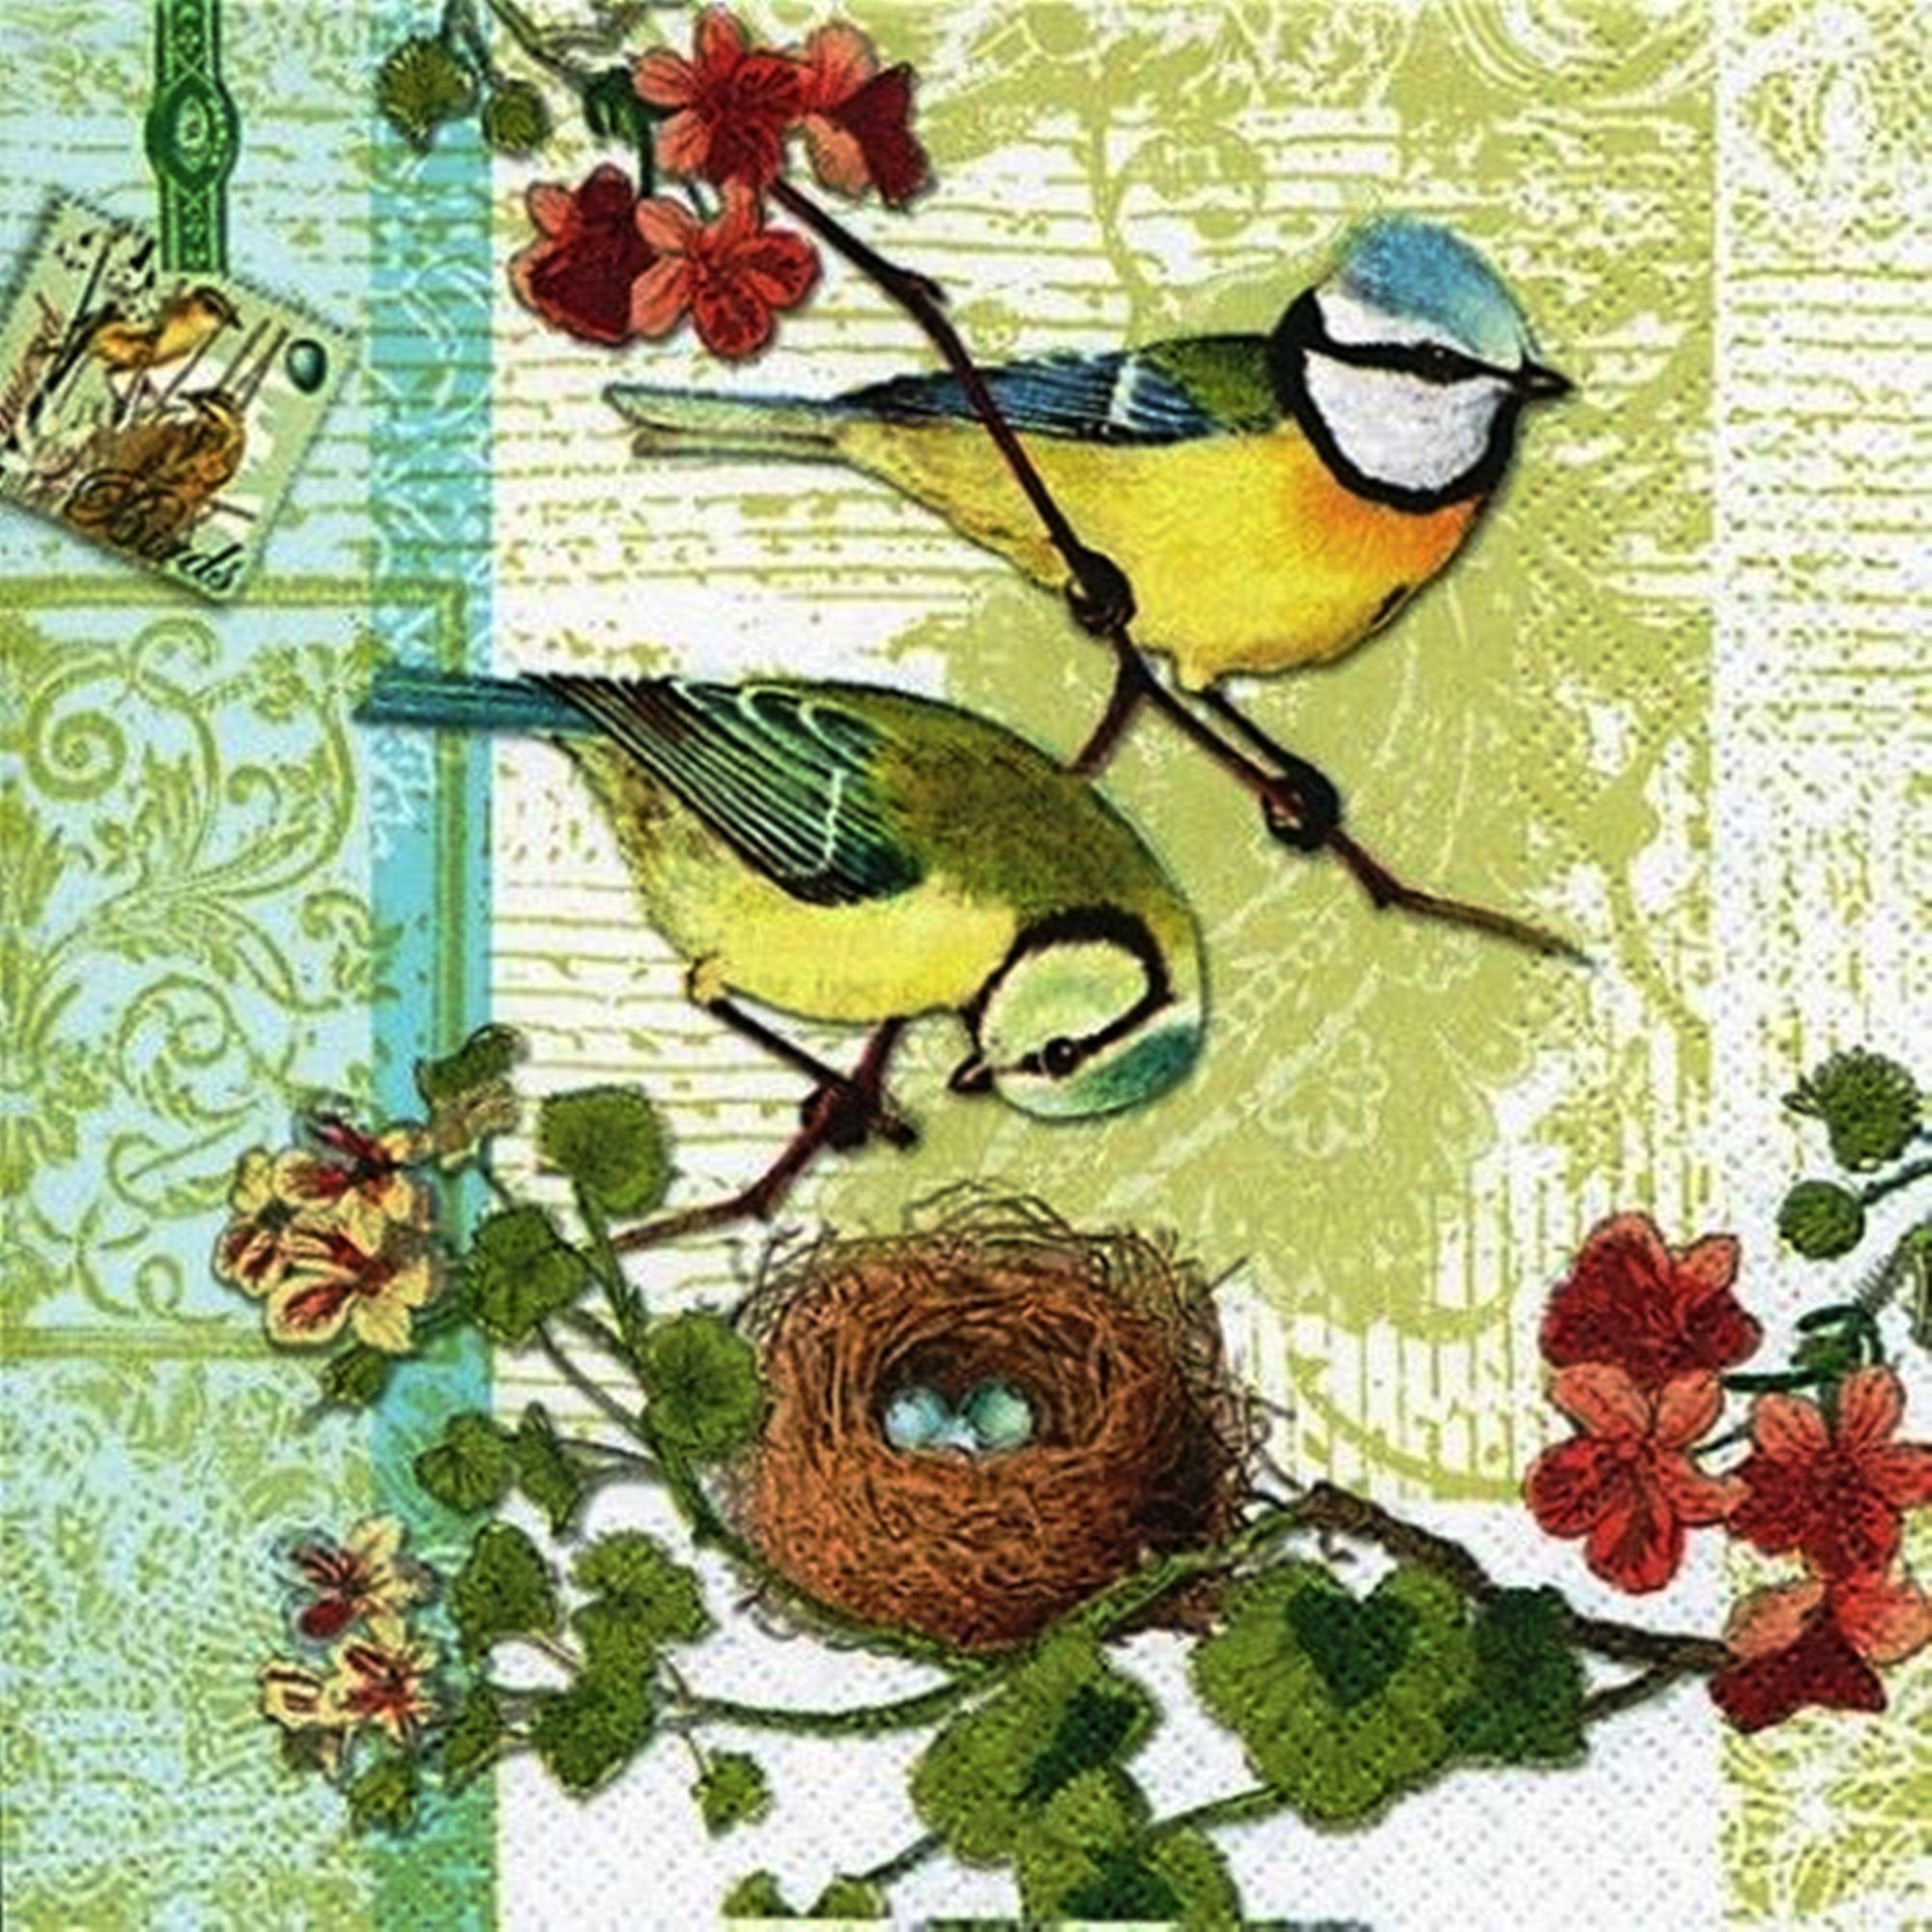 4 Paper Napkins Serviettes - Birds Family, Nest on the tree, Wild Nature Napkins Collection, Decoupage Paper Napkins, Scrap Booking Paper